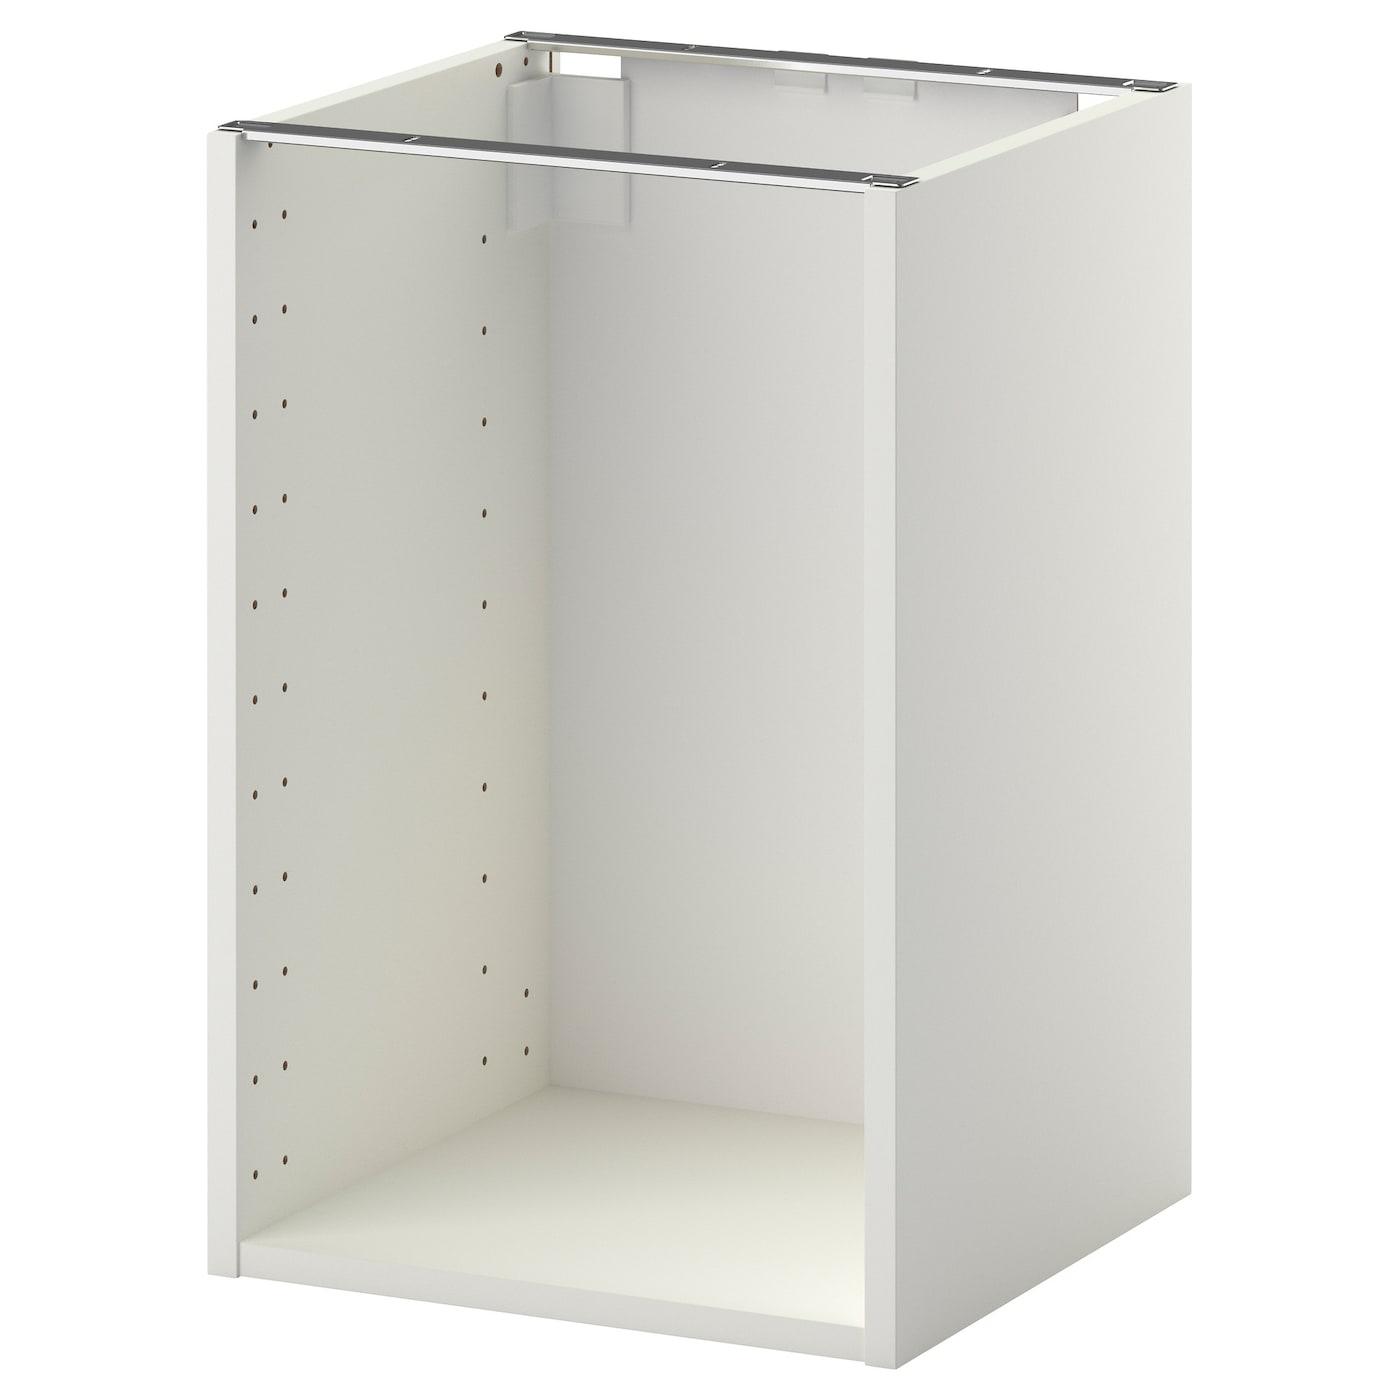 Ikea Kitchen Cabinet Construction: METOD Base Cabinet Frame White 40x37x60 Cm